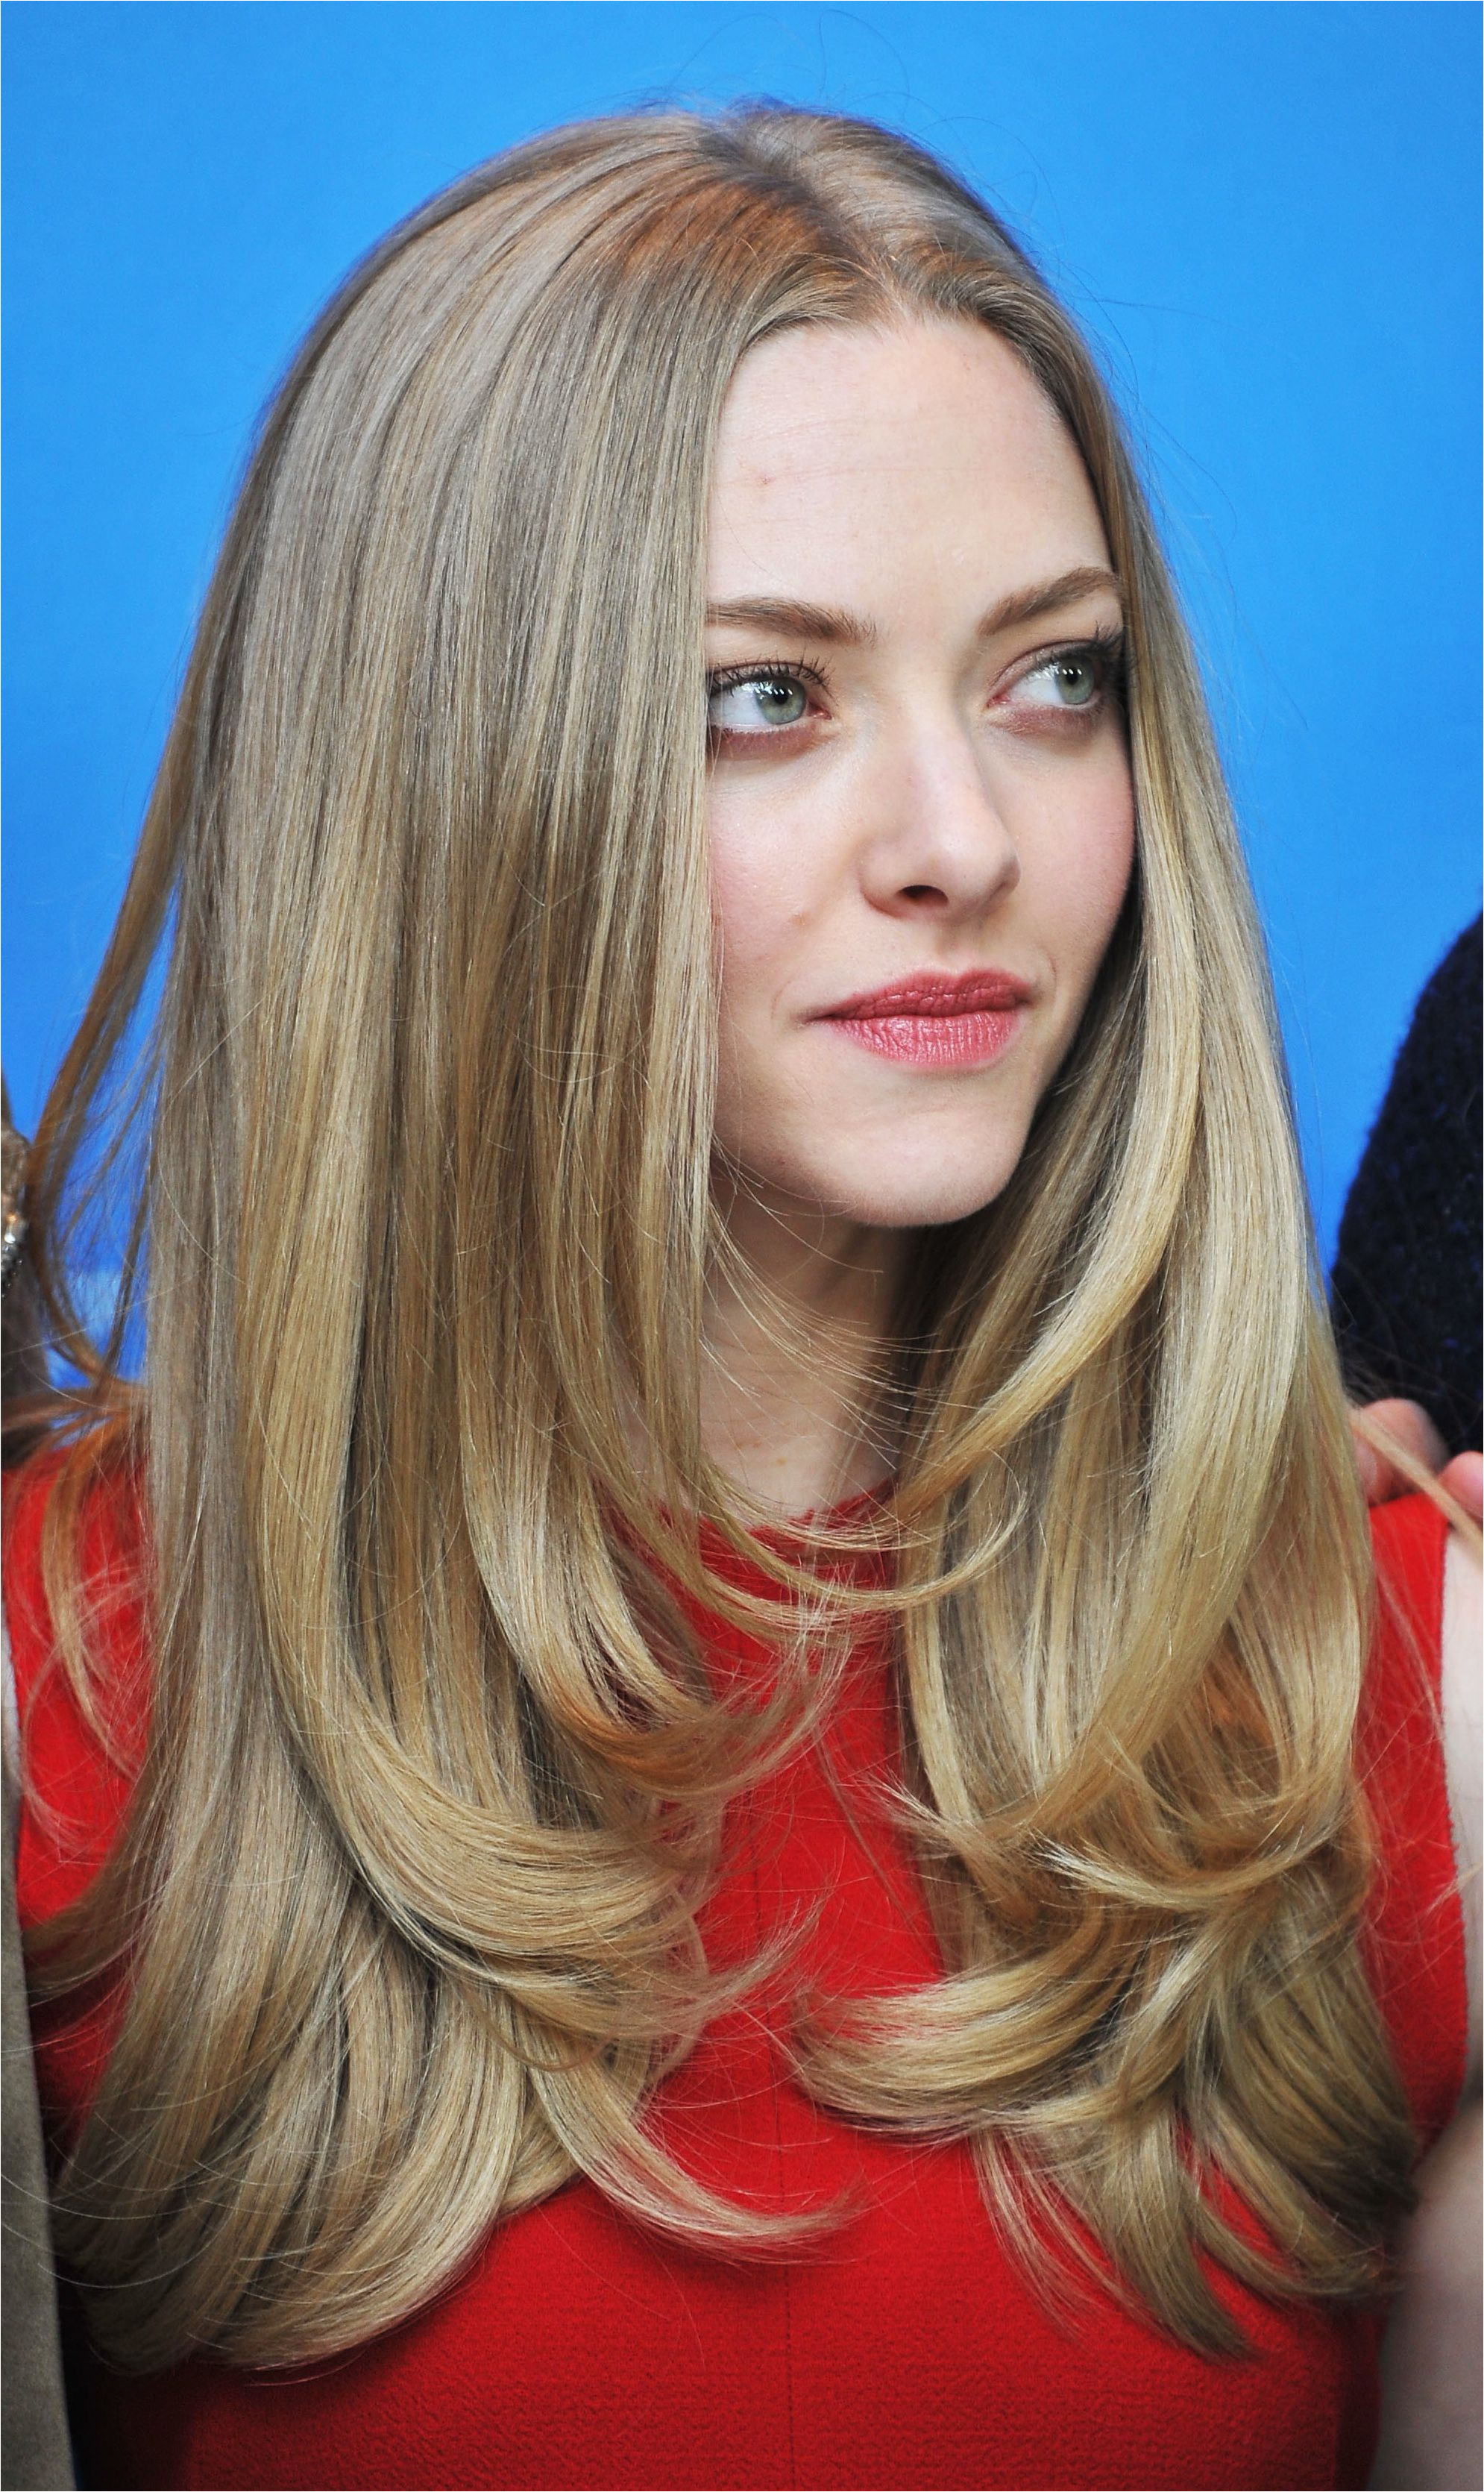 amanda seyfried blonde hair 56a084a65f9b58eba4b